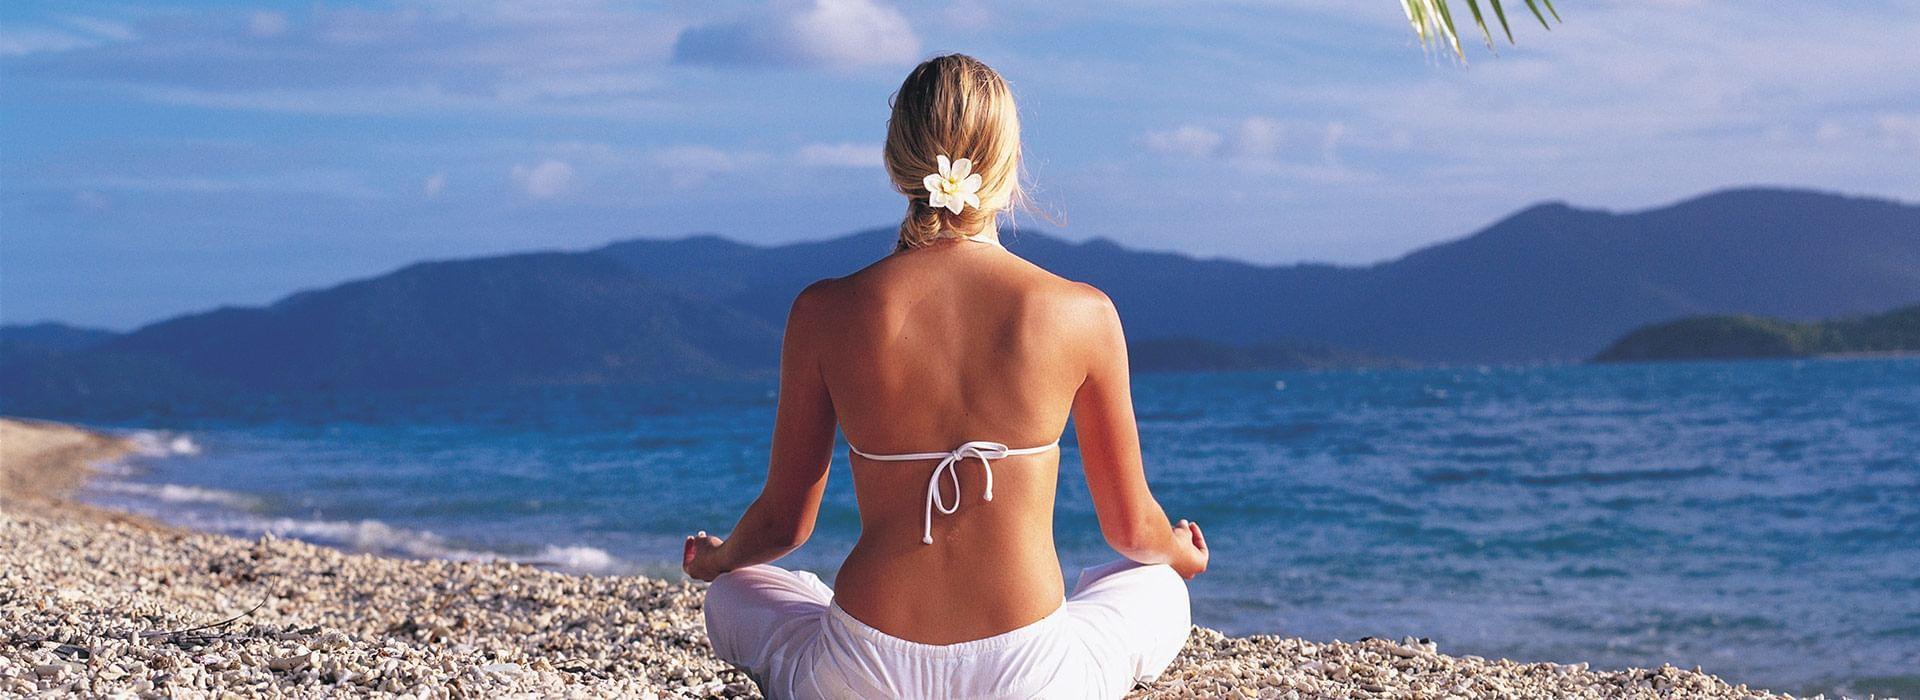 Woman practicing Yoga on beach at Daydream Island Resort